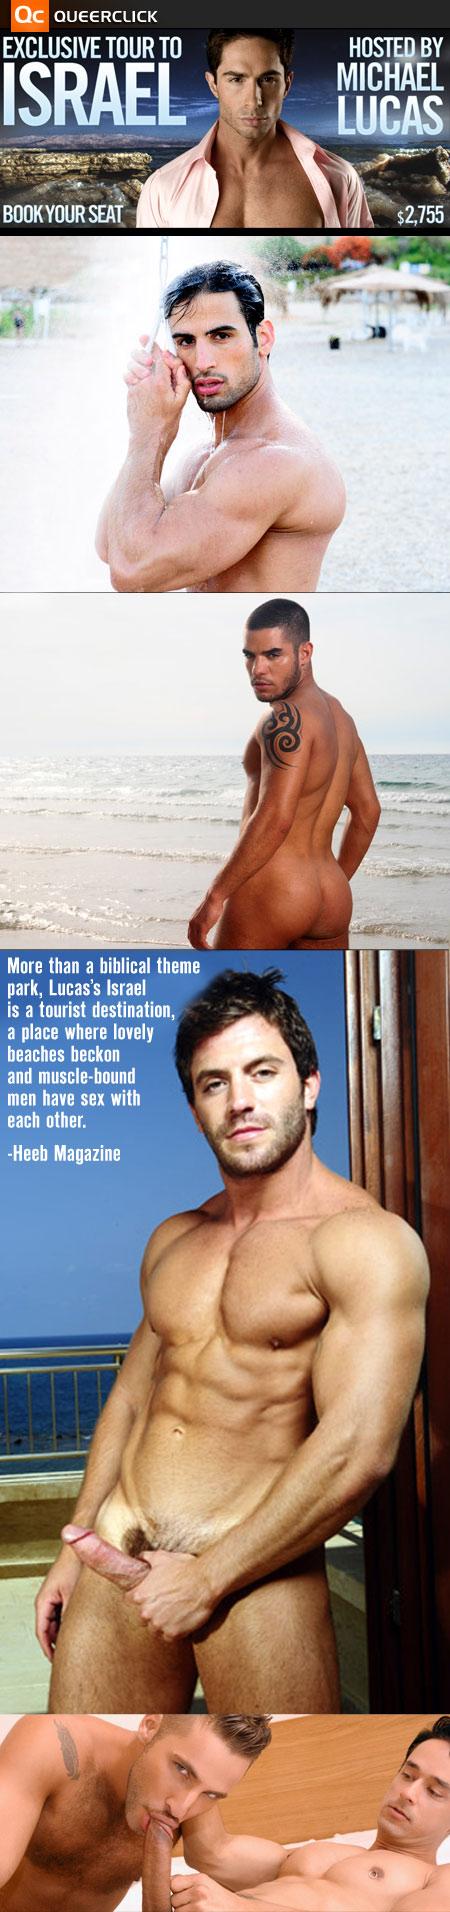 michael lucas tour of israel You're gay Wallpaper